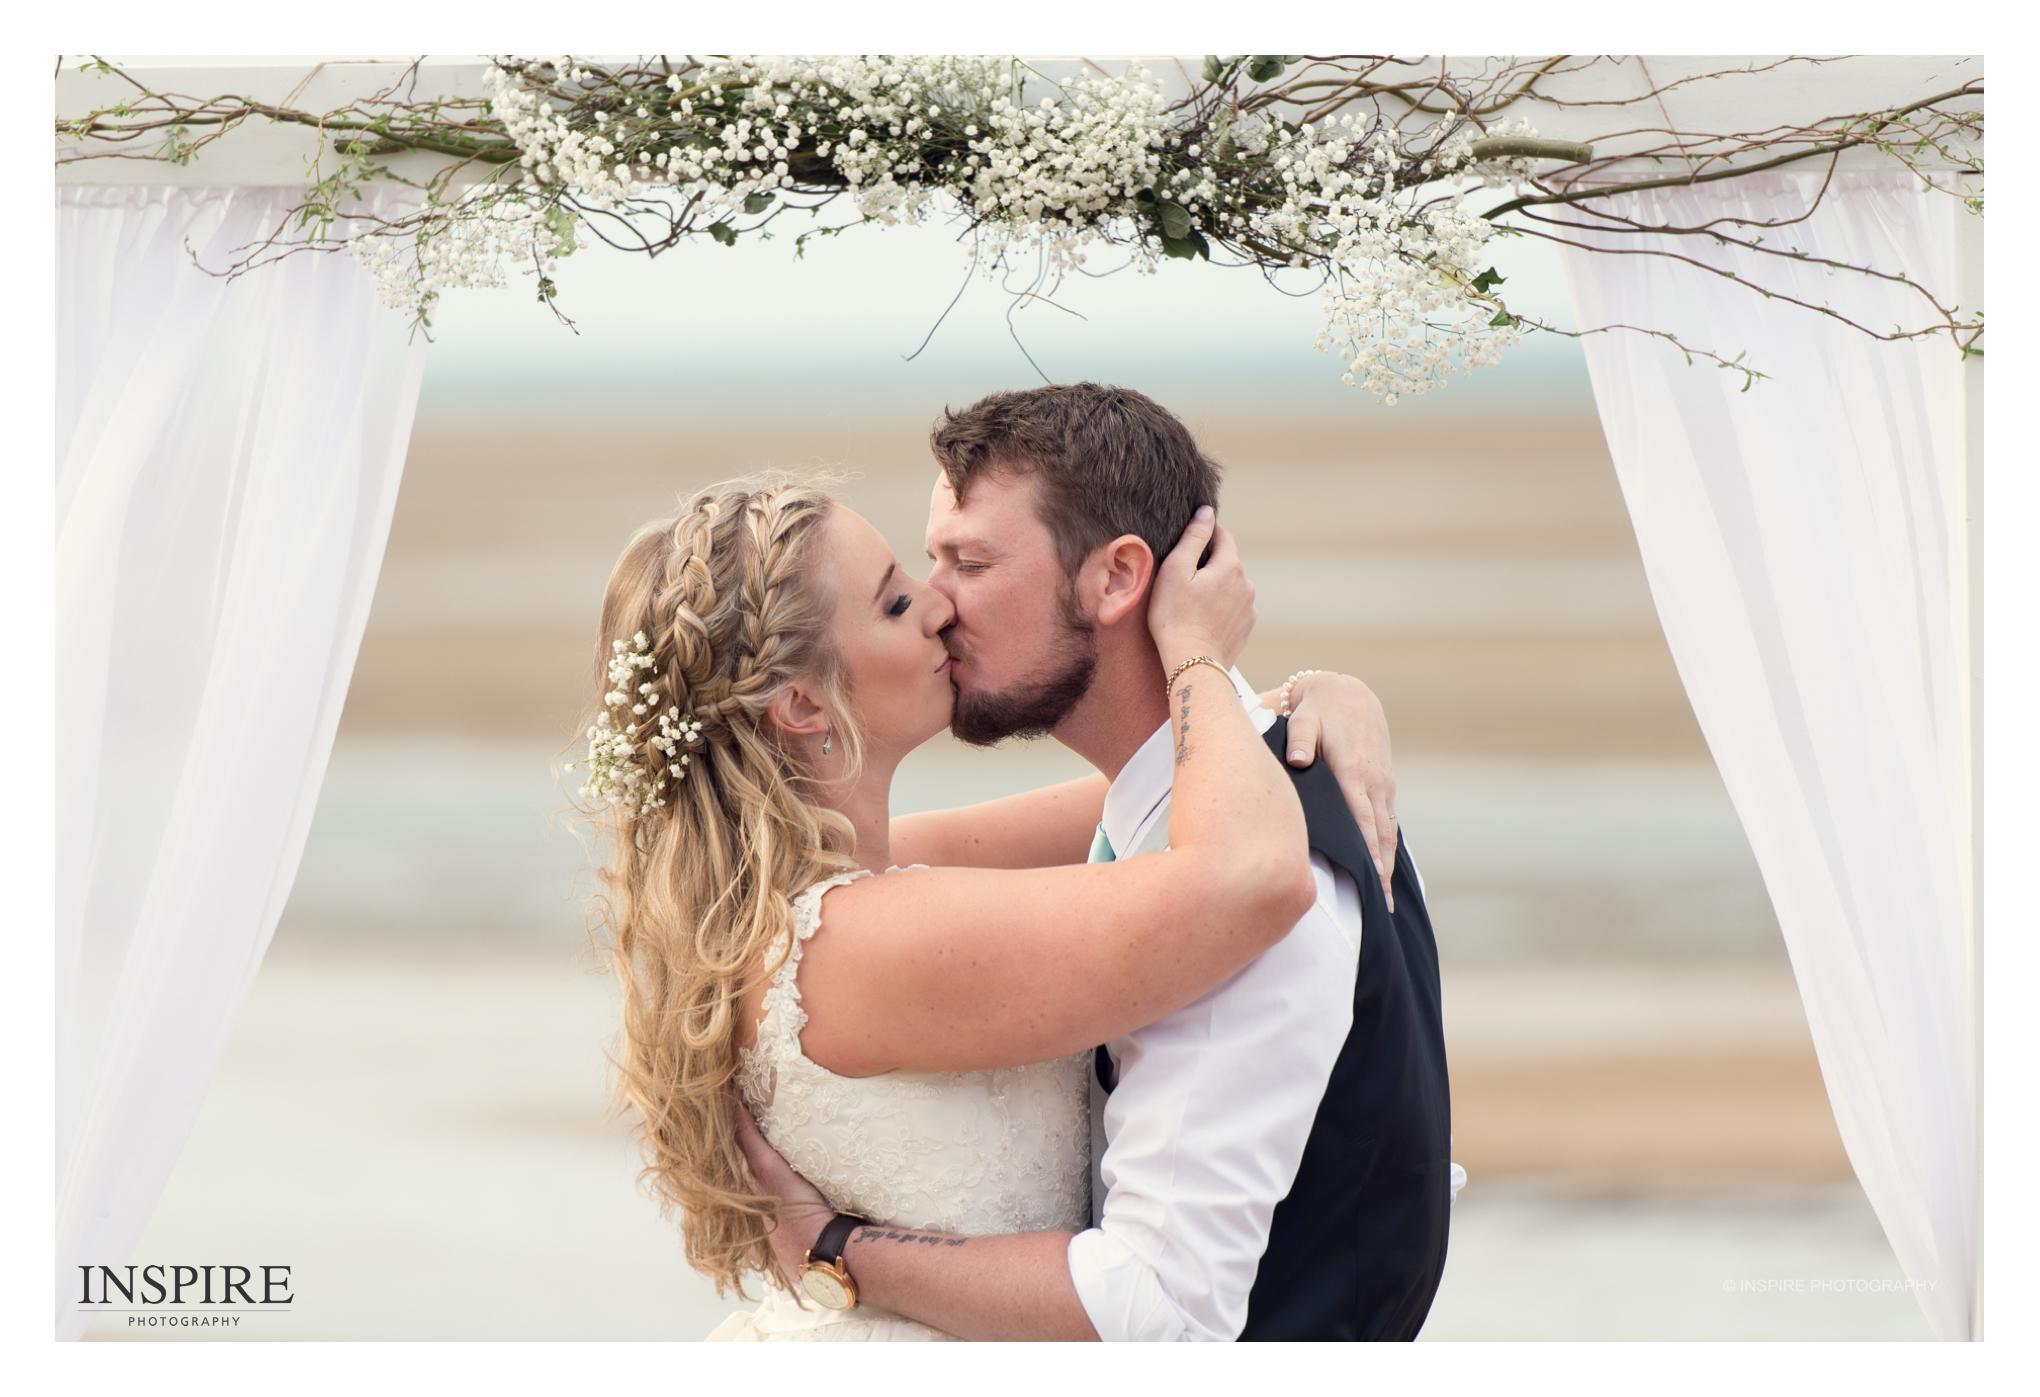 Nick & Bree wedding blog 20.jpg